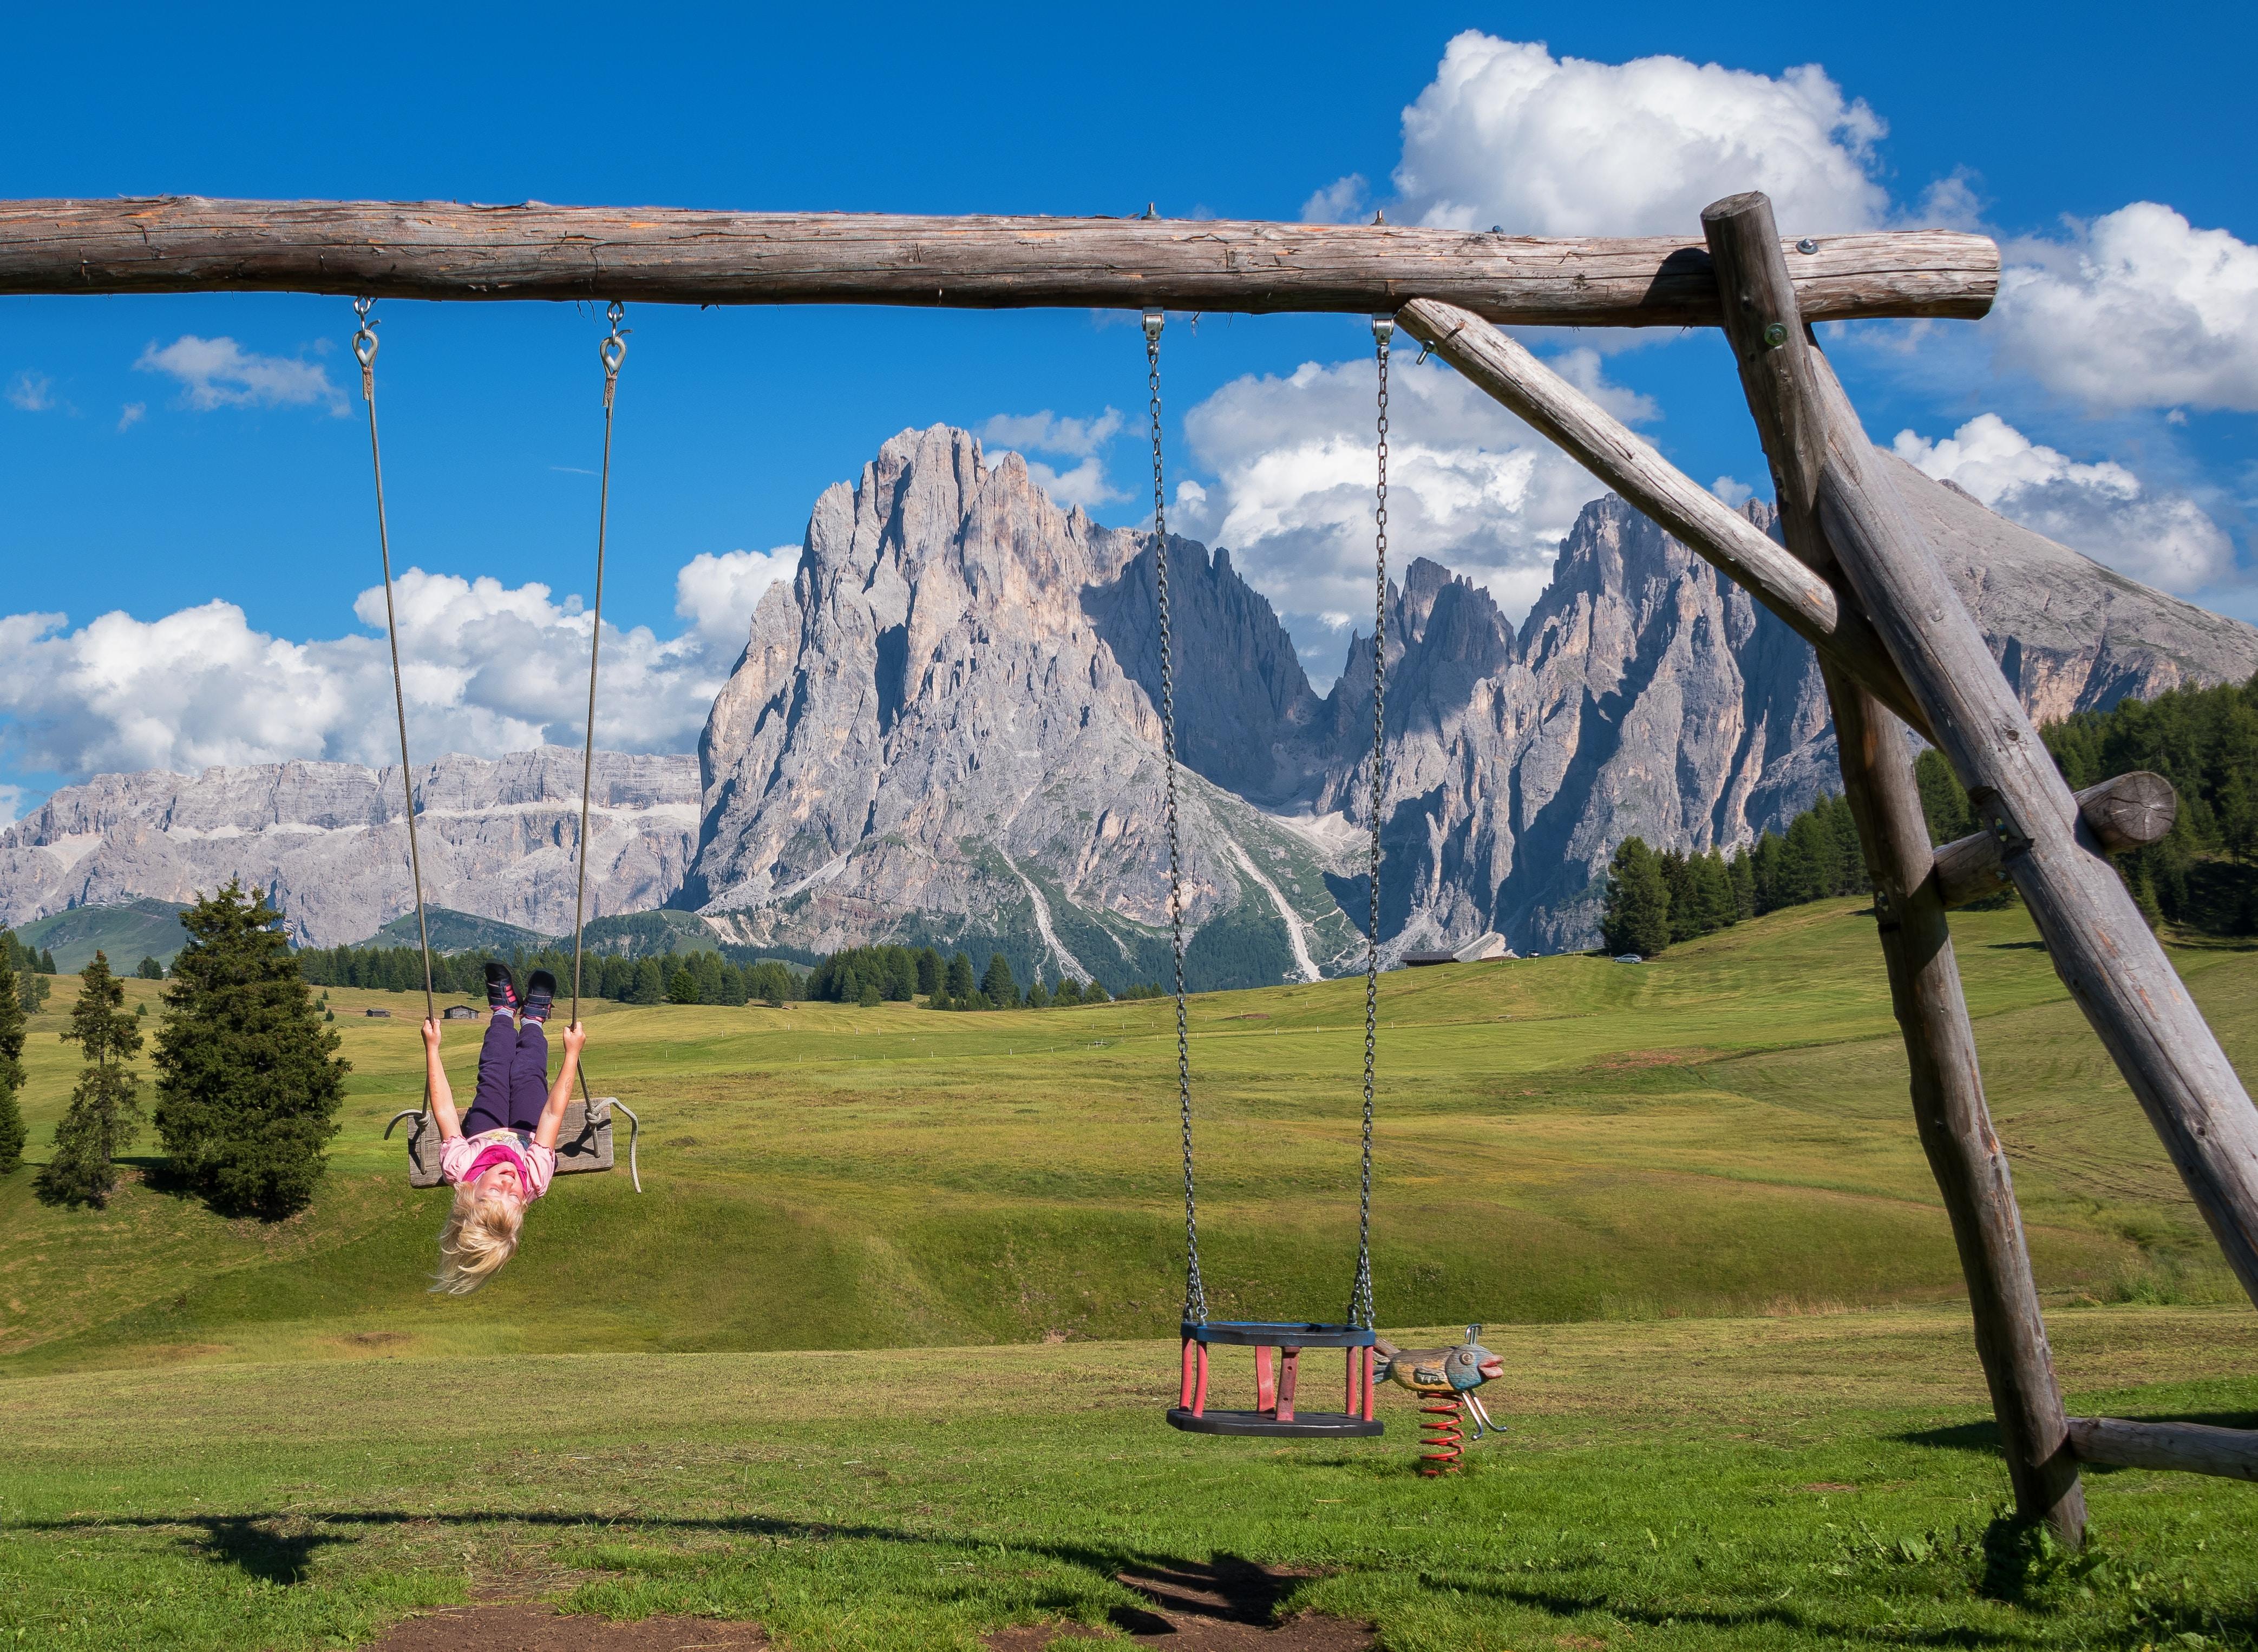 girl riding on swing facing mountain